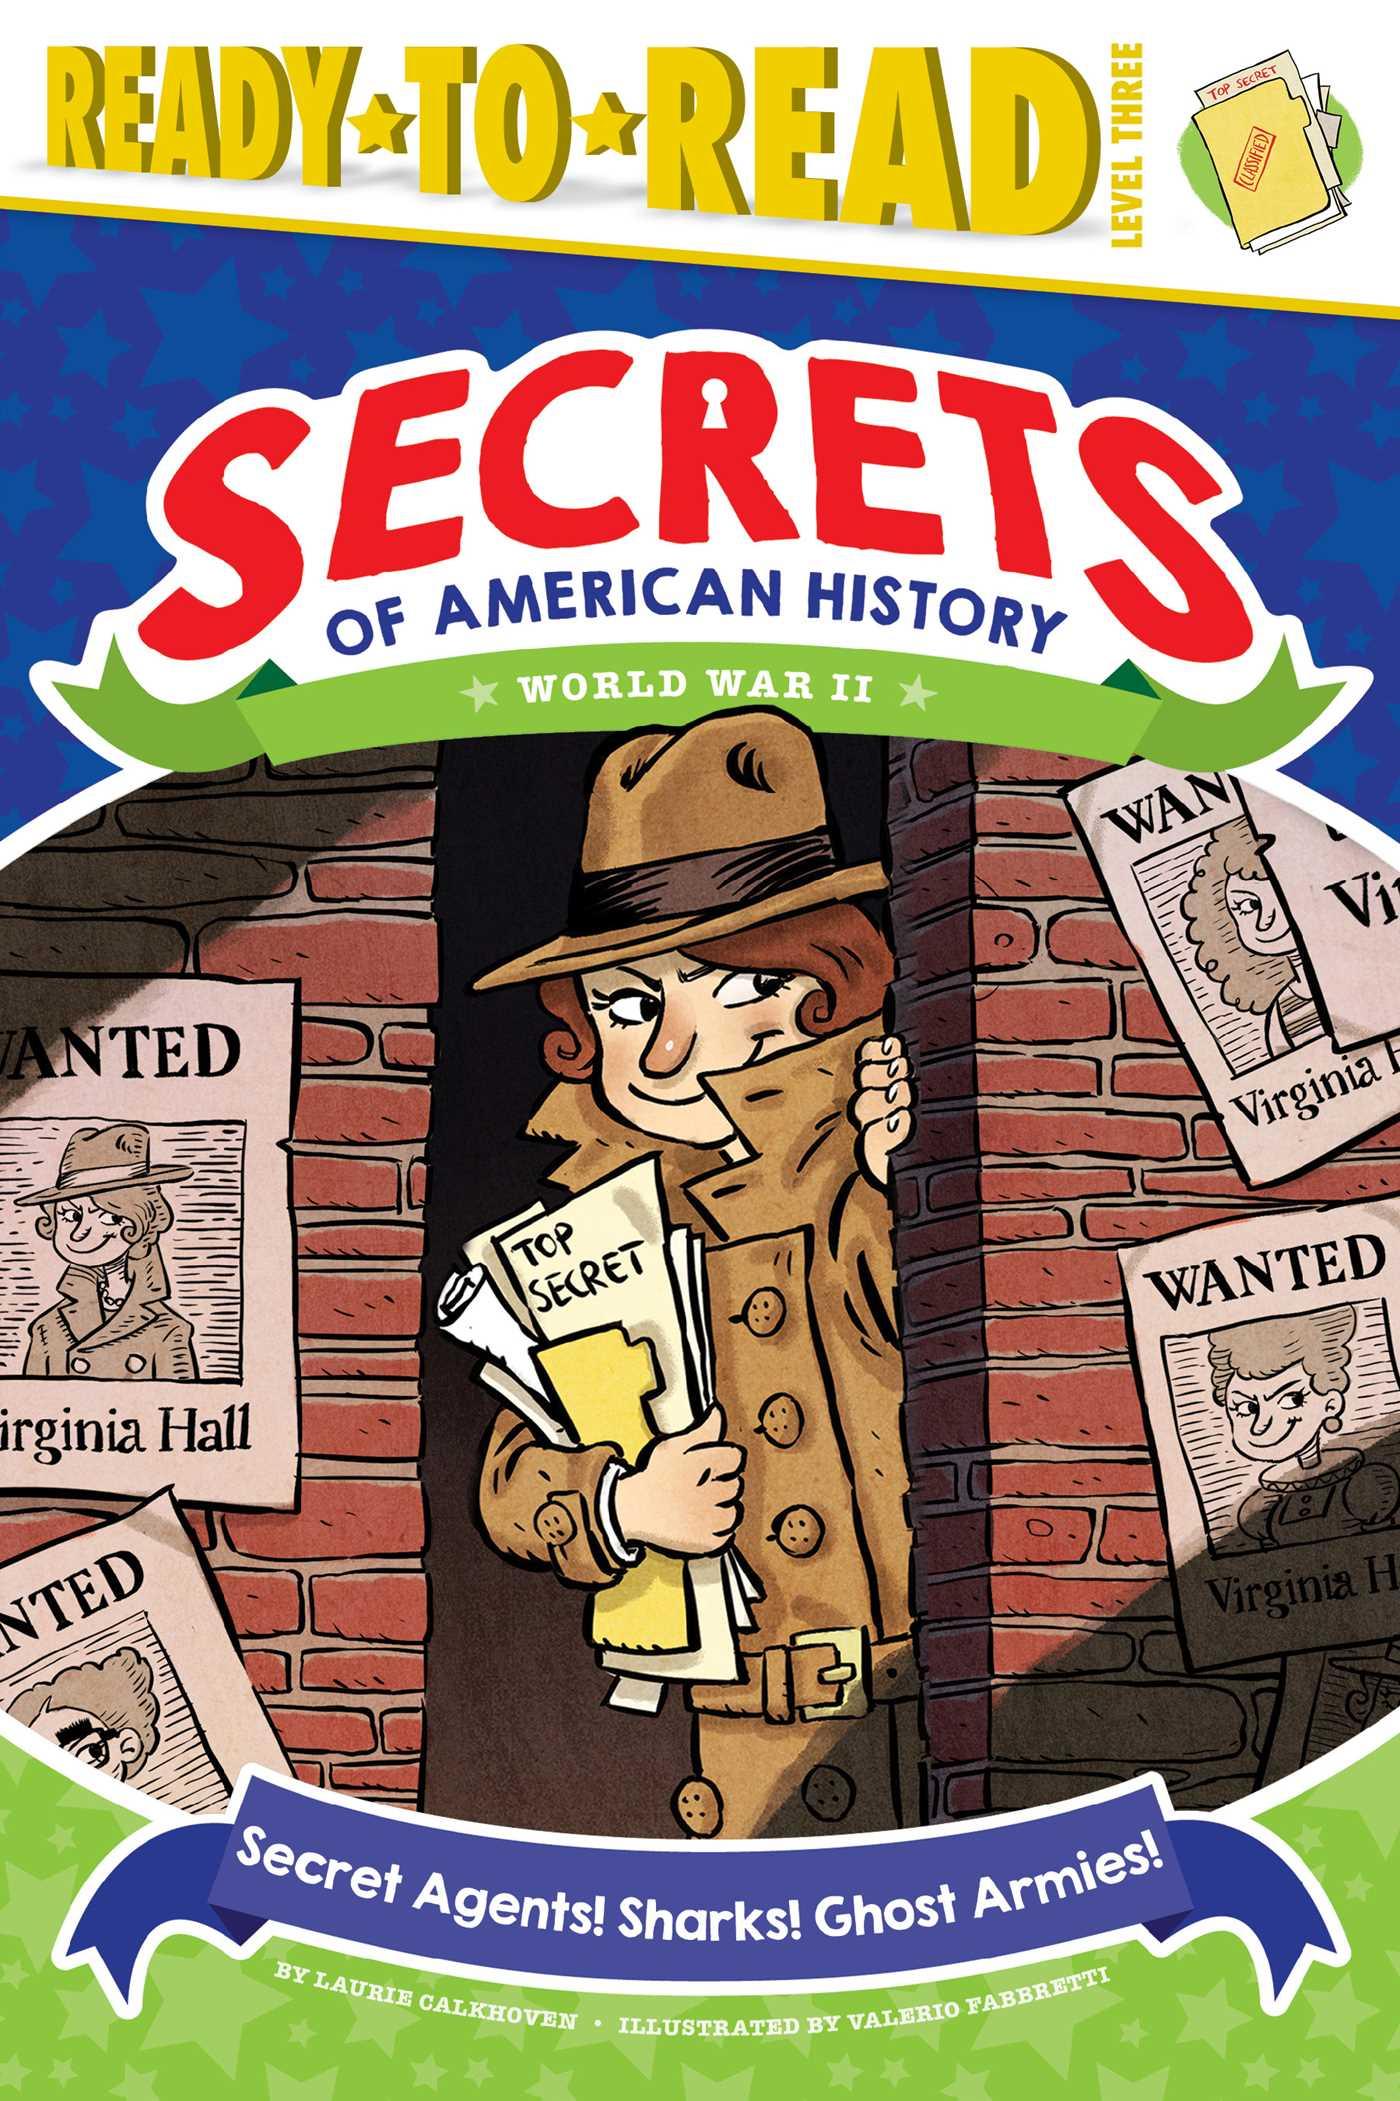 Secret agents sharks ghost armies 9781481499484 hr